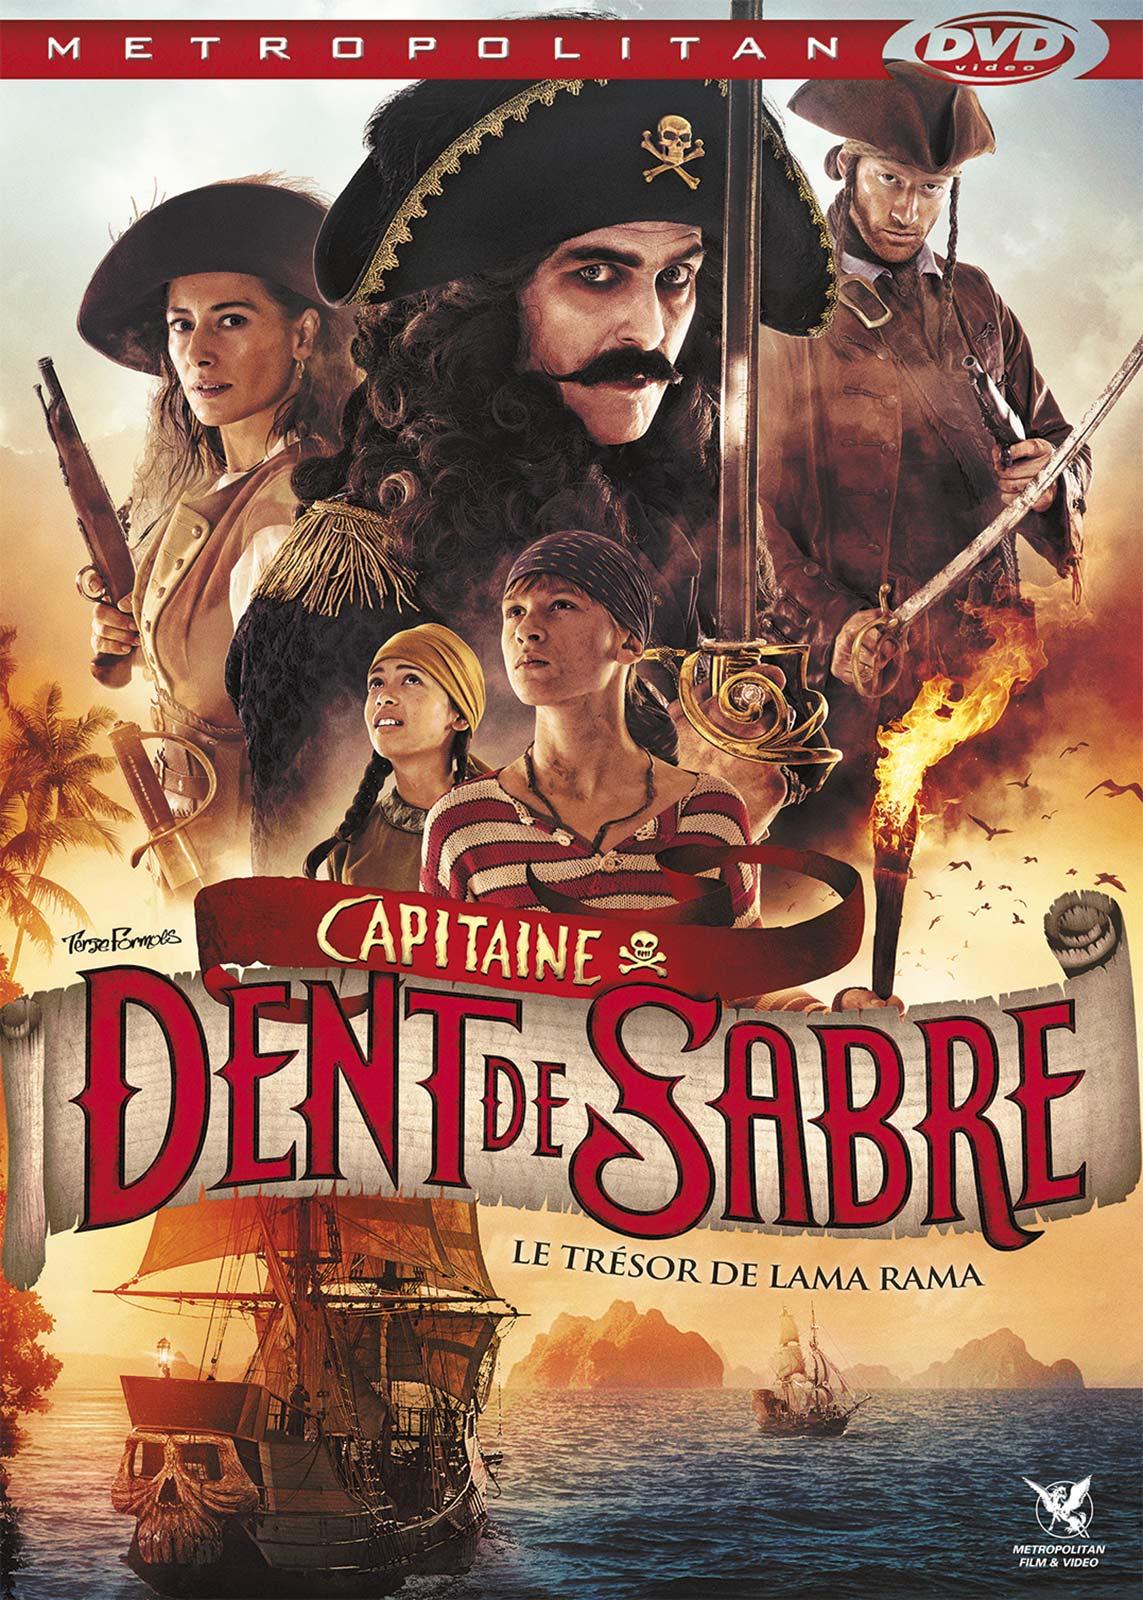 Capitaine Dent de Sabre Le trésor de Lama Rama